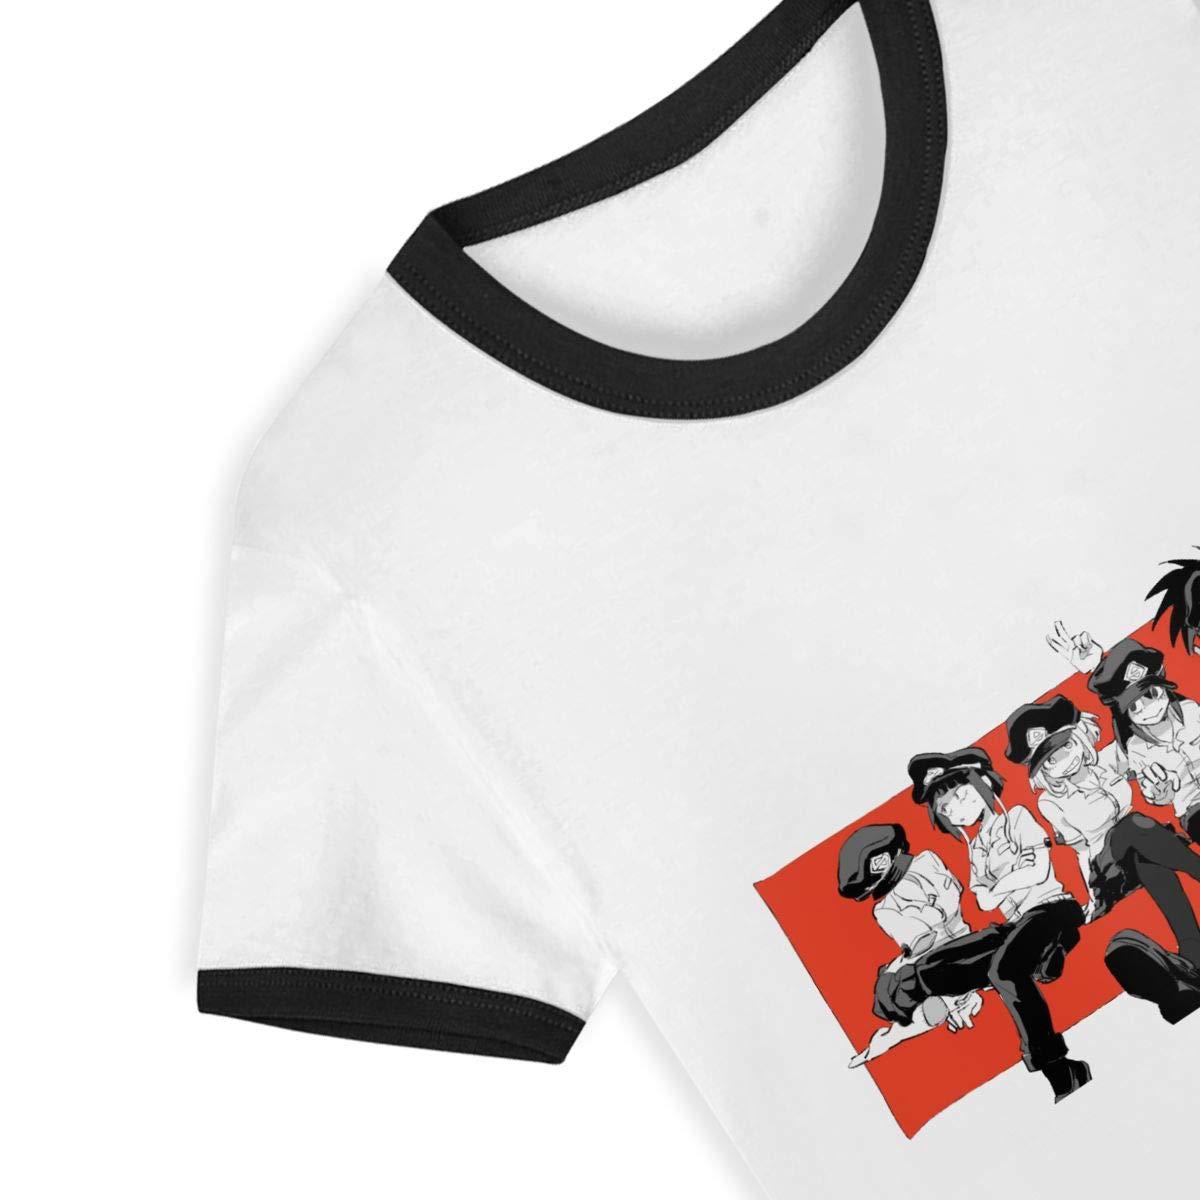 EVAGIBBONS My Hero Academy Child Leisure Cute Fashion Life T Shirt